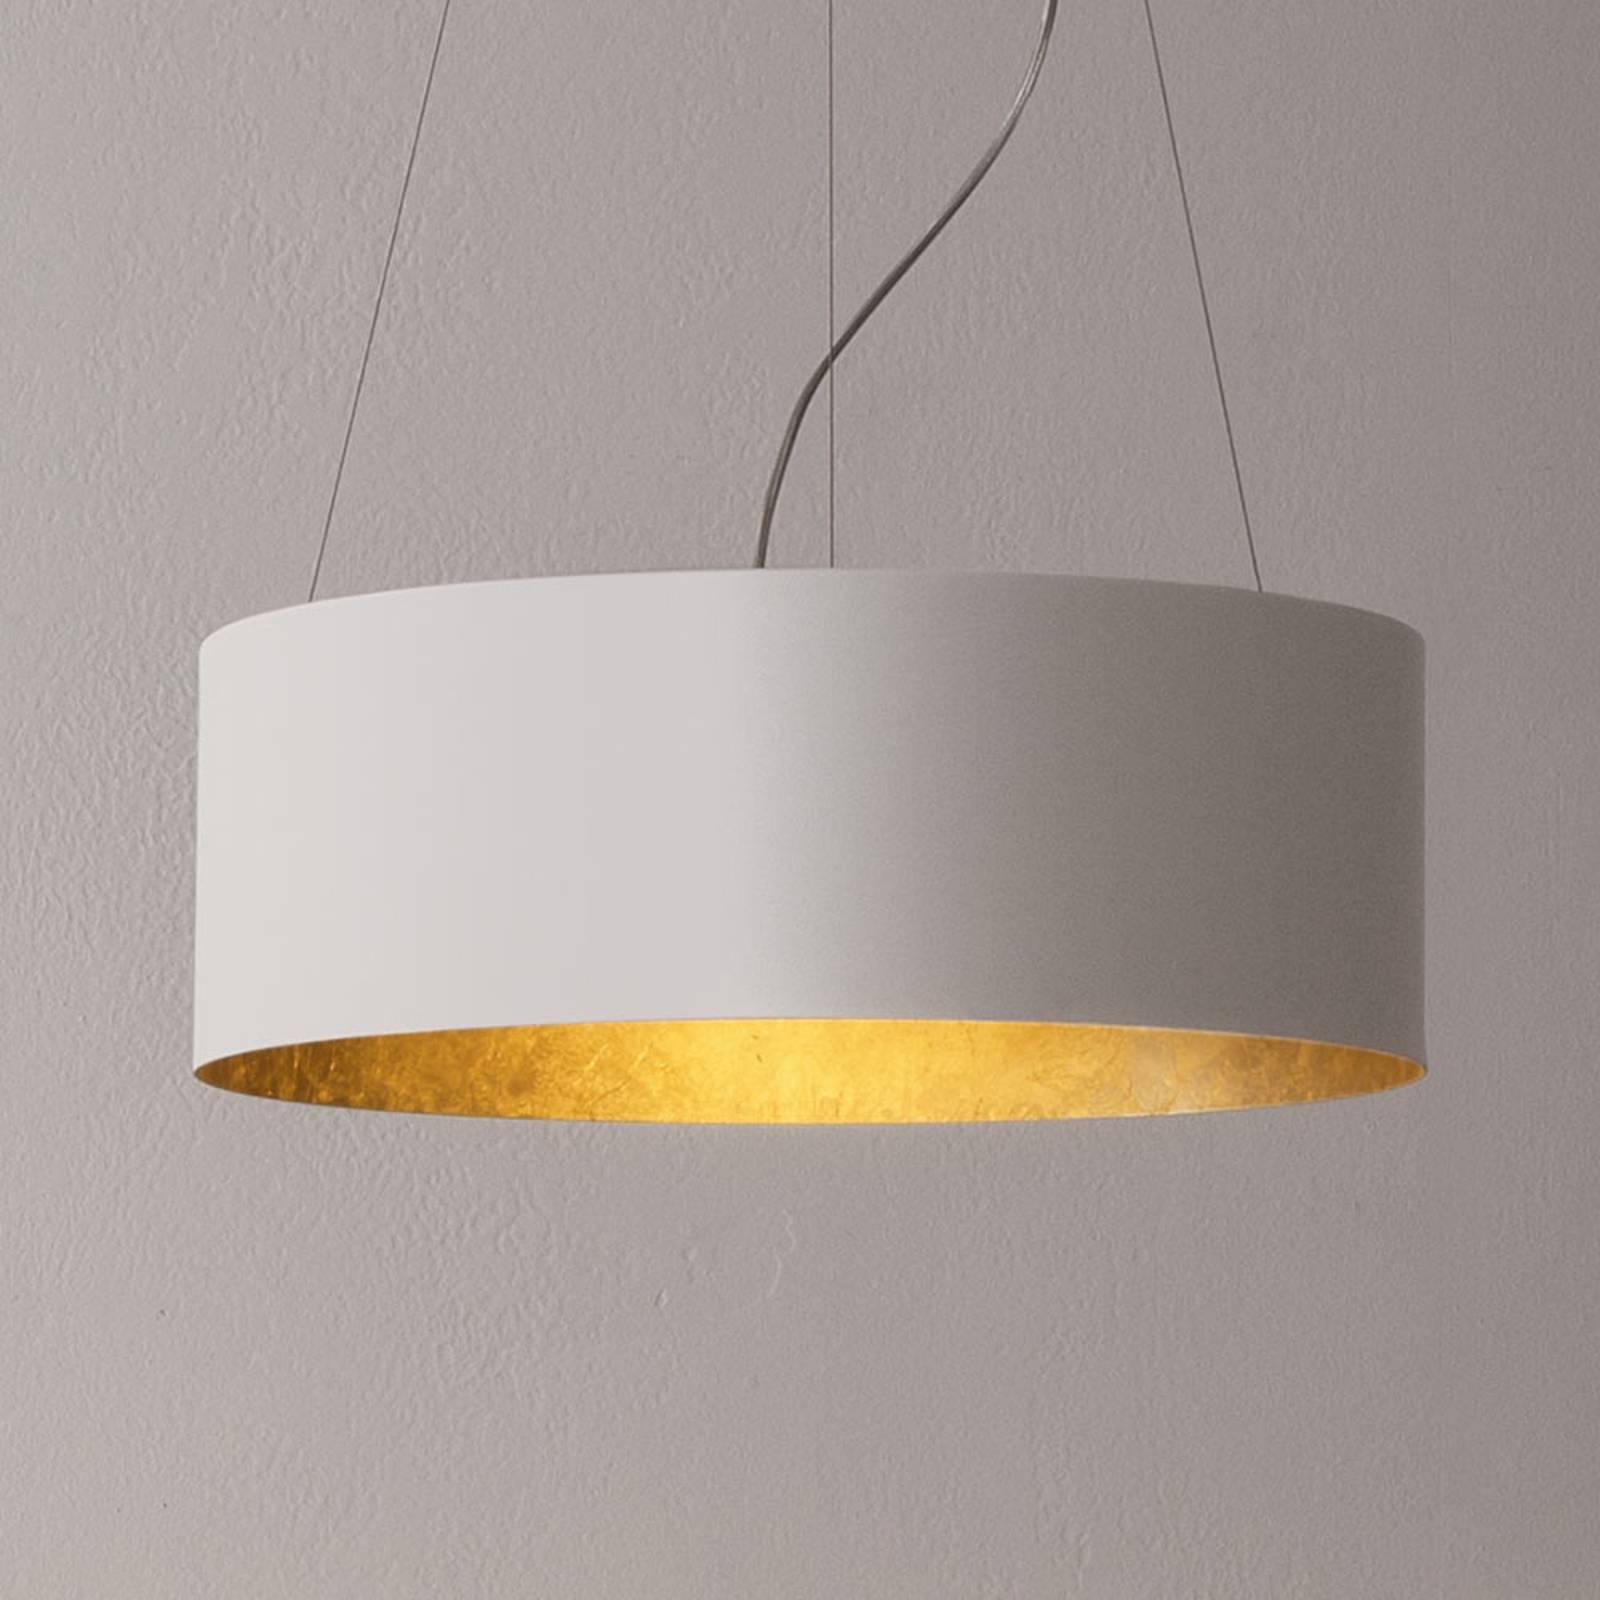 ICONE Olimpia LED-Hängeleuchte mit edlem Blattgold